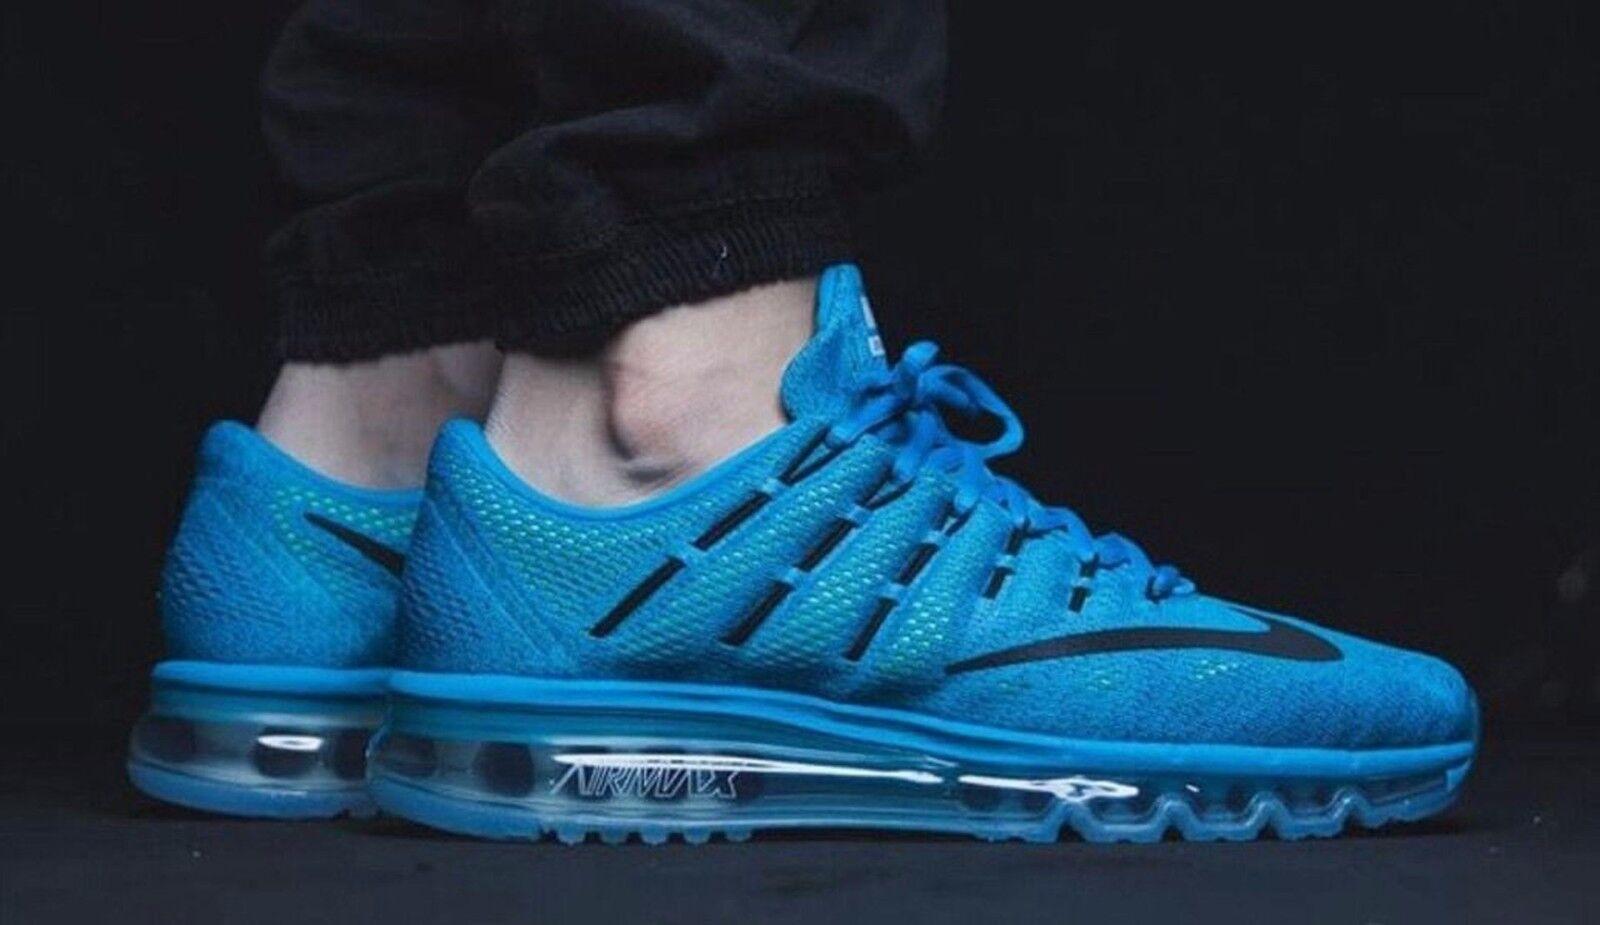 Nike air max 2016 Uomo sz 12 806771-400 laguna blu / nero coraggioso blu